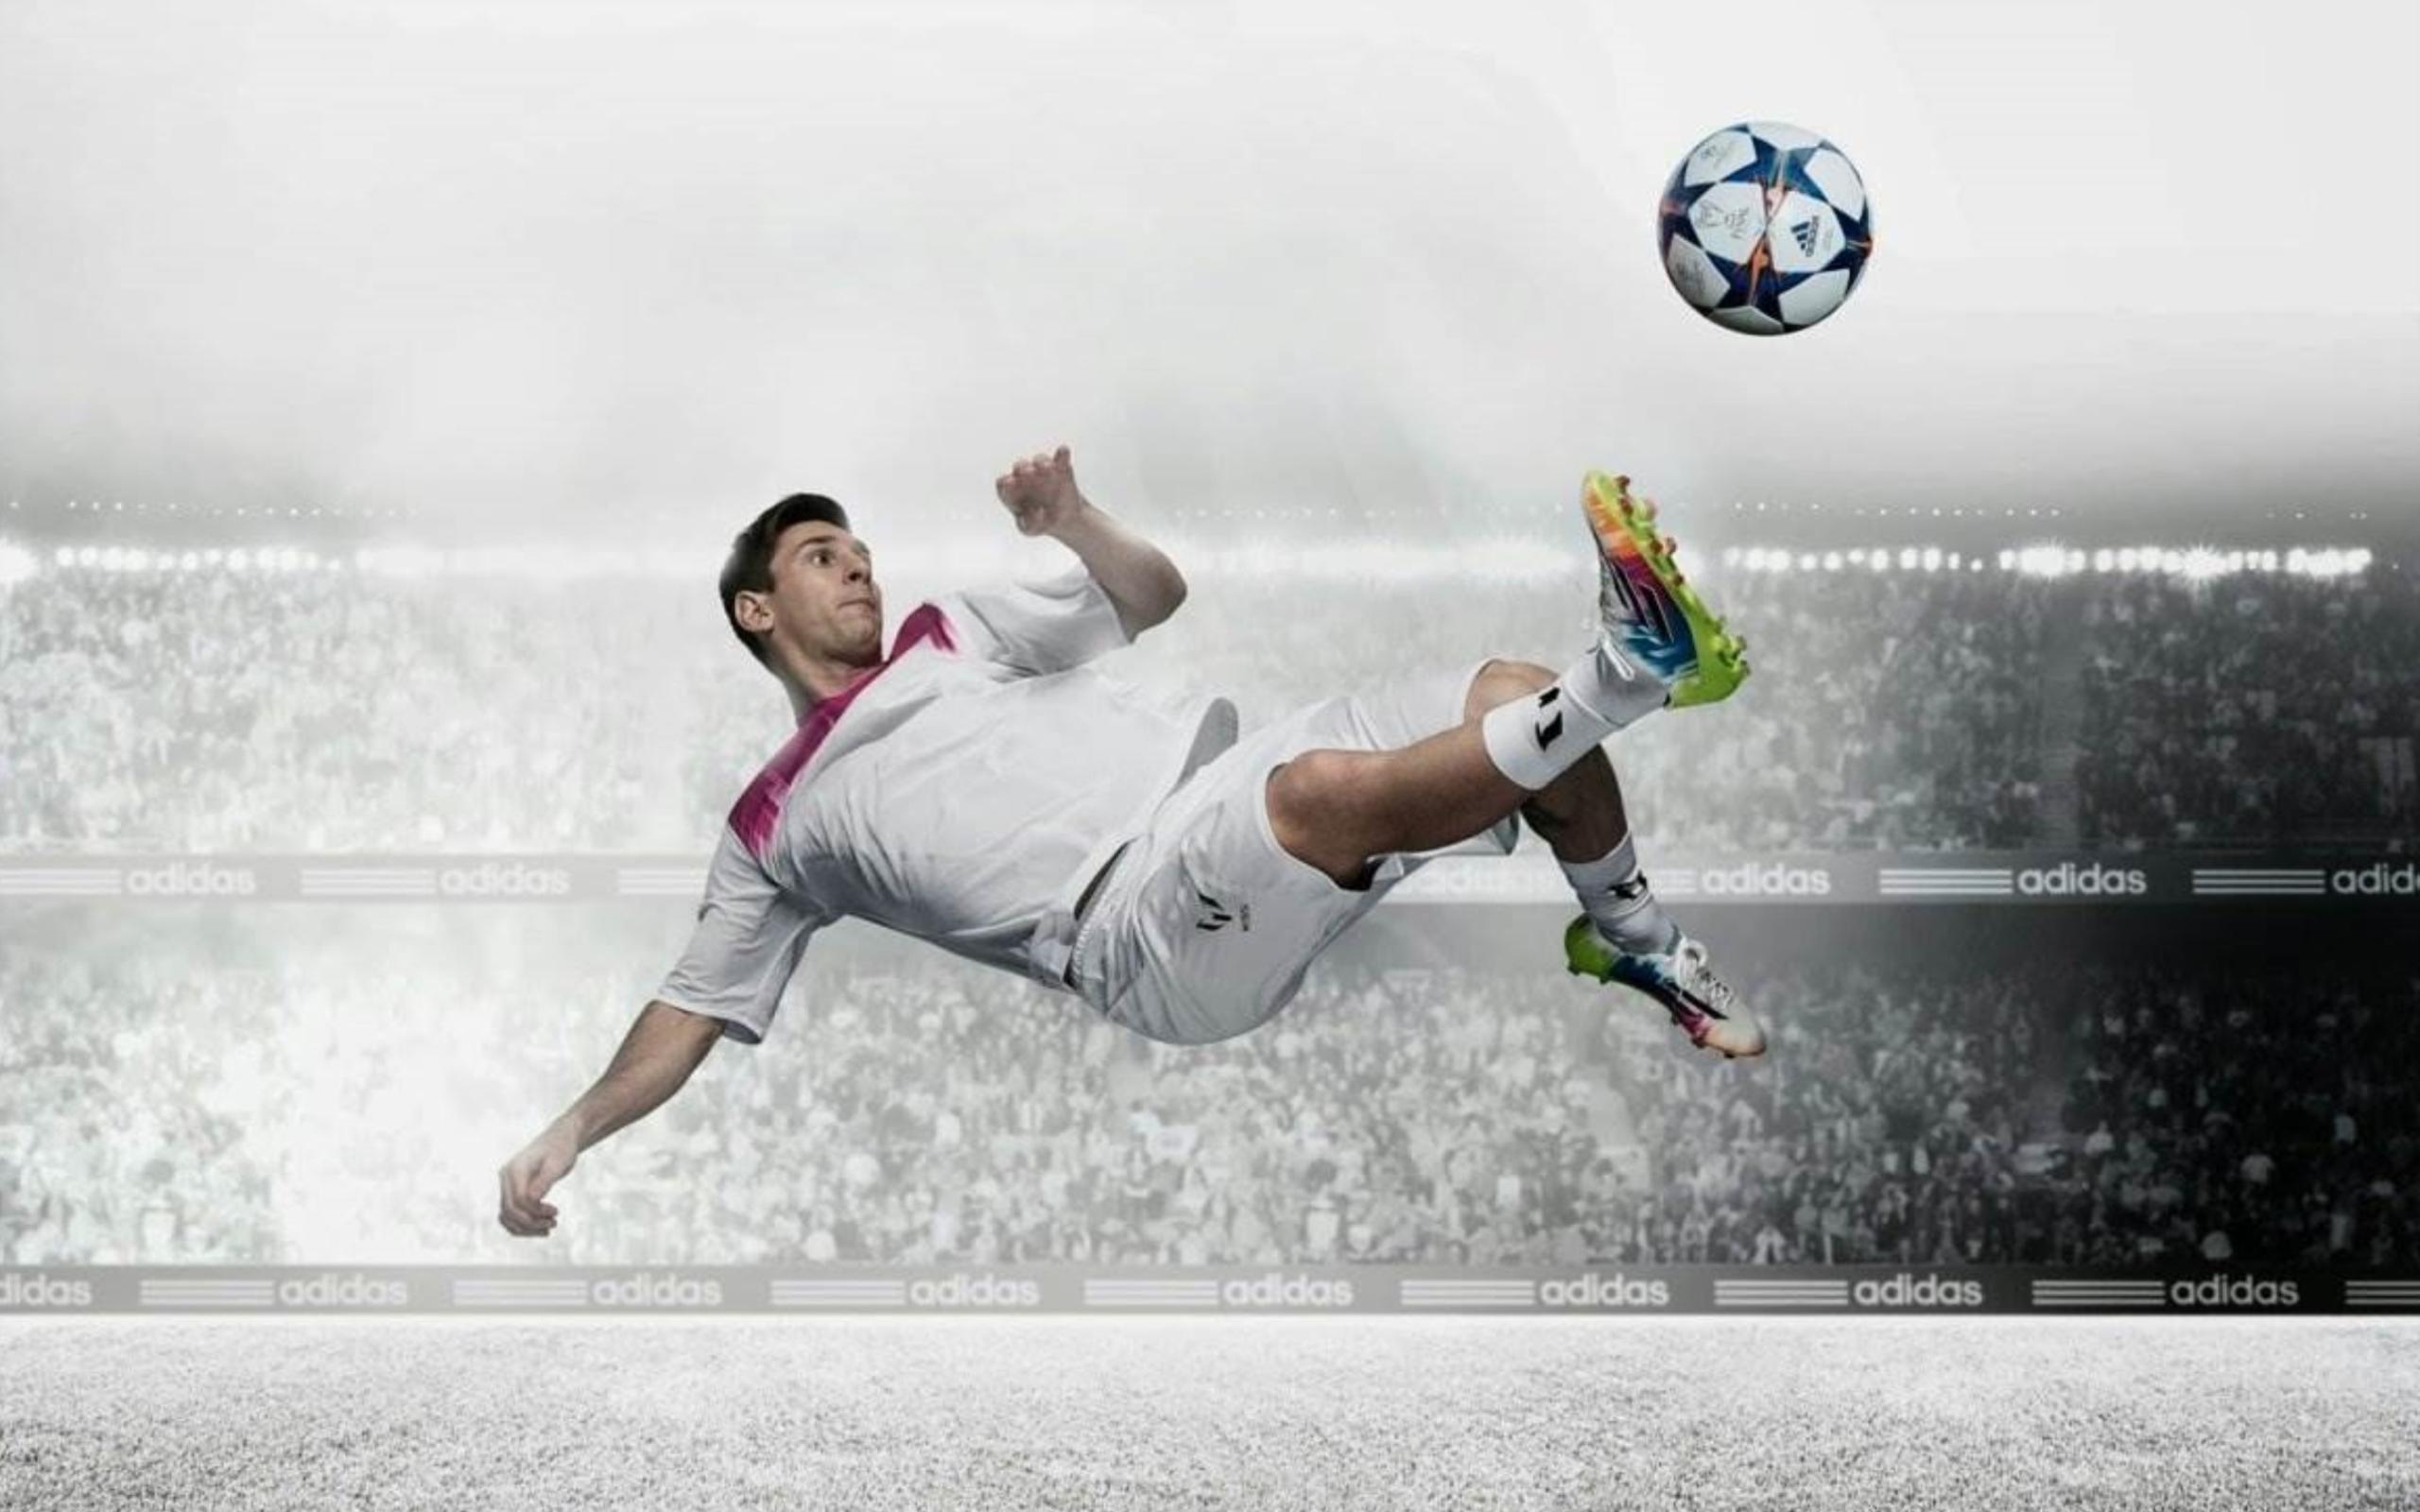 Cool Quotes Wallpapers For Desktop Download Free Adidas Soccer Background Pixelstalk Net